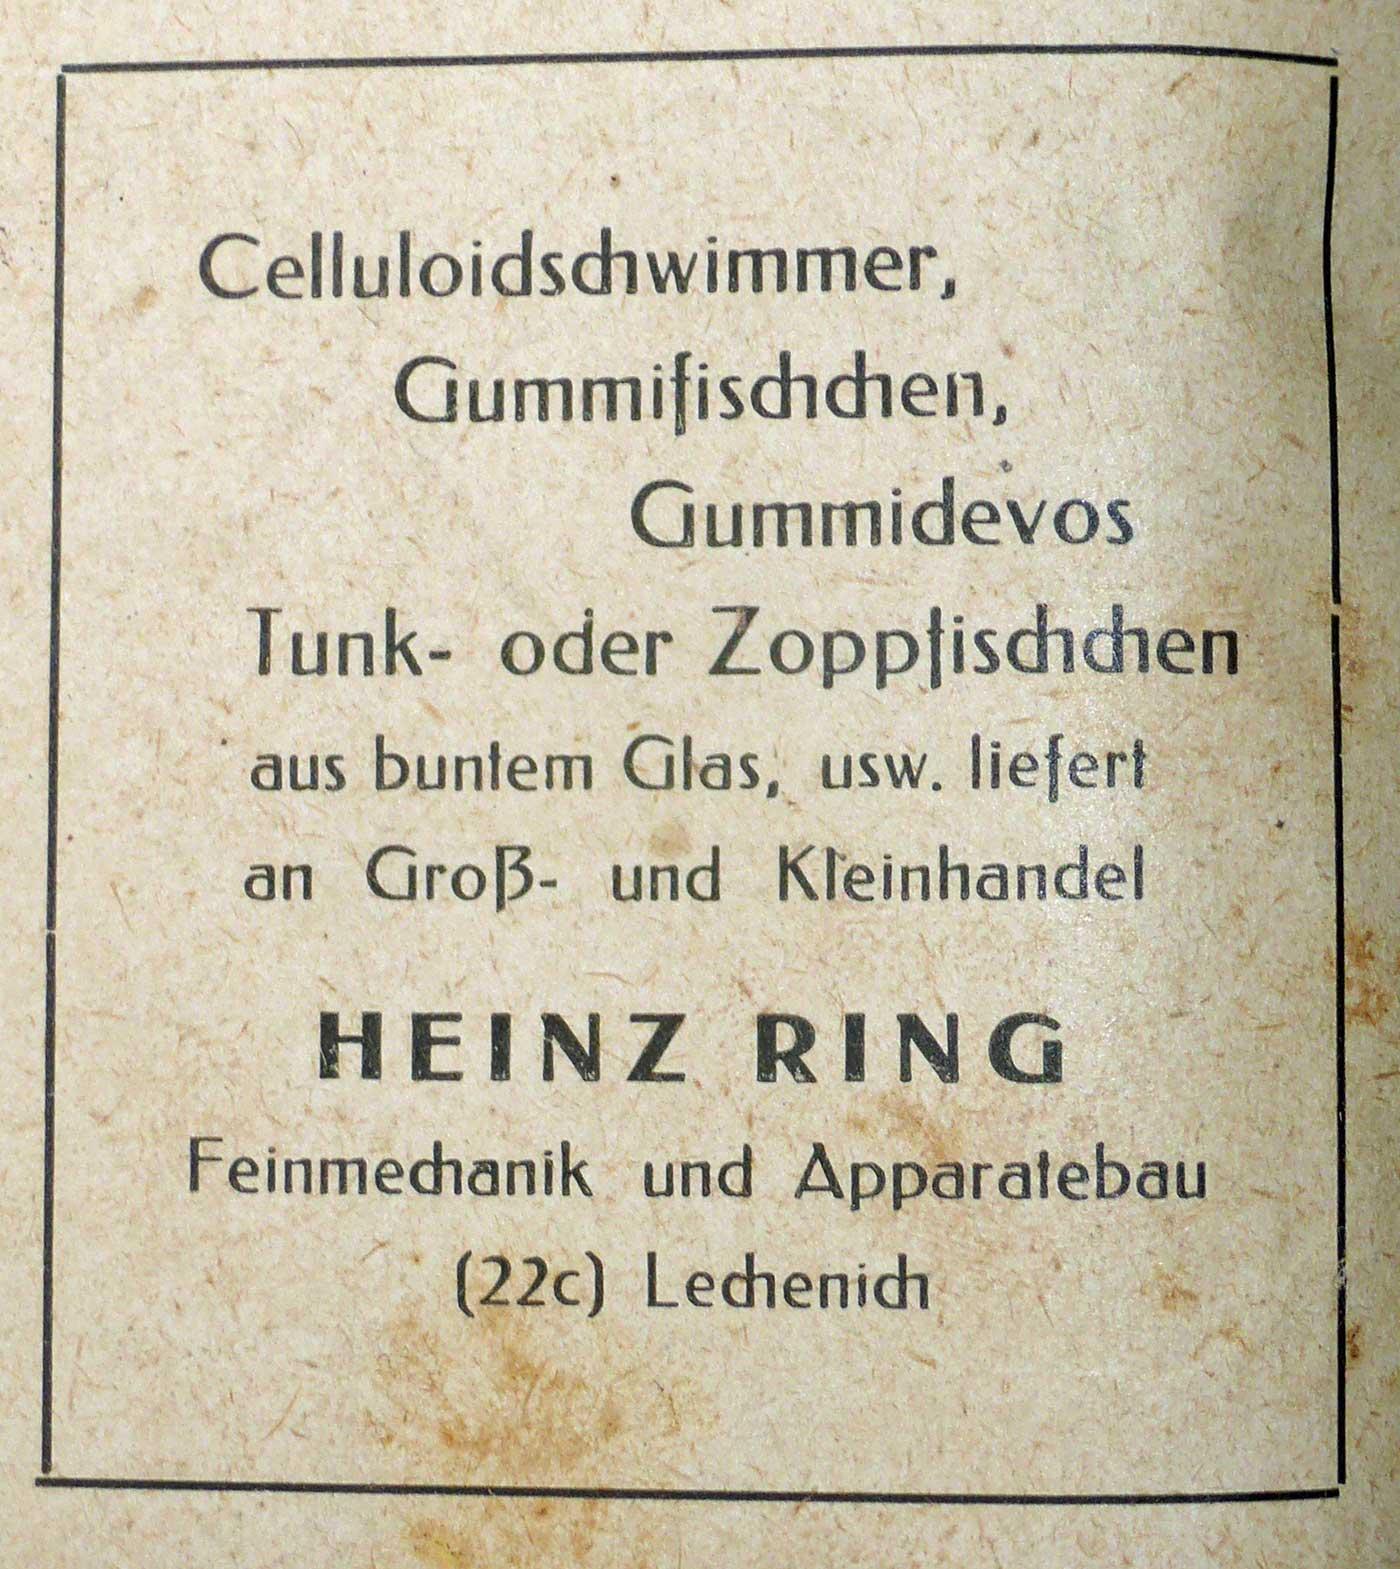 Heinz Ring, Lechenich